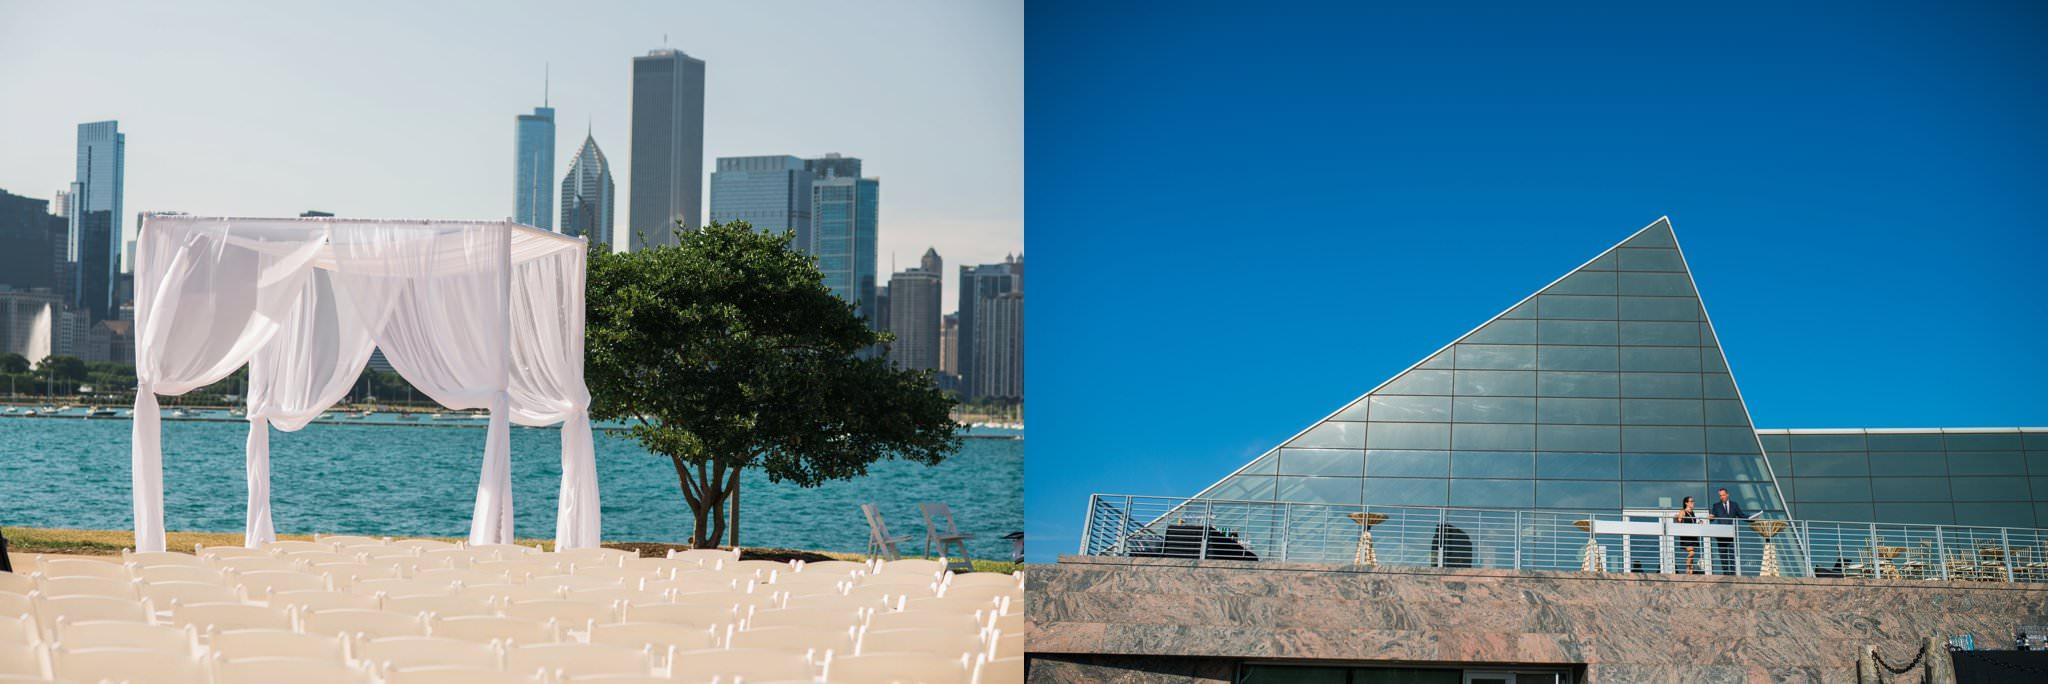 Adler-Planetarium-Chicago-Wedding-Photography-0050.JPG